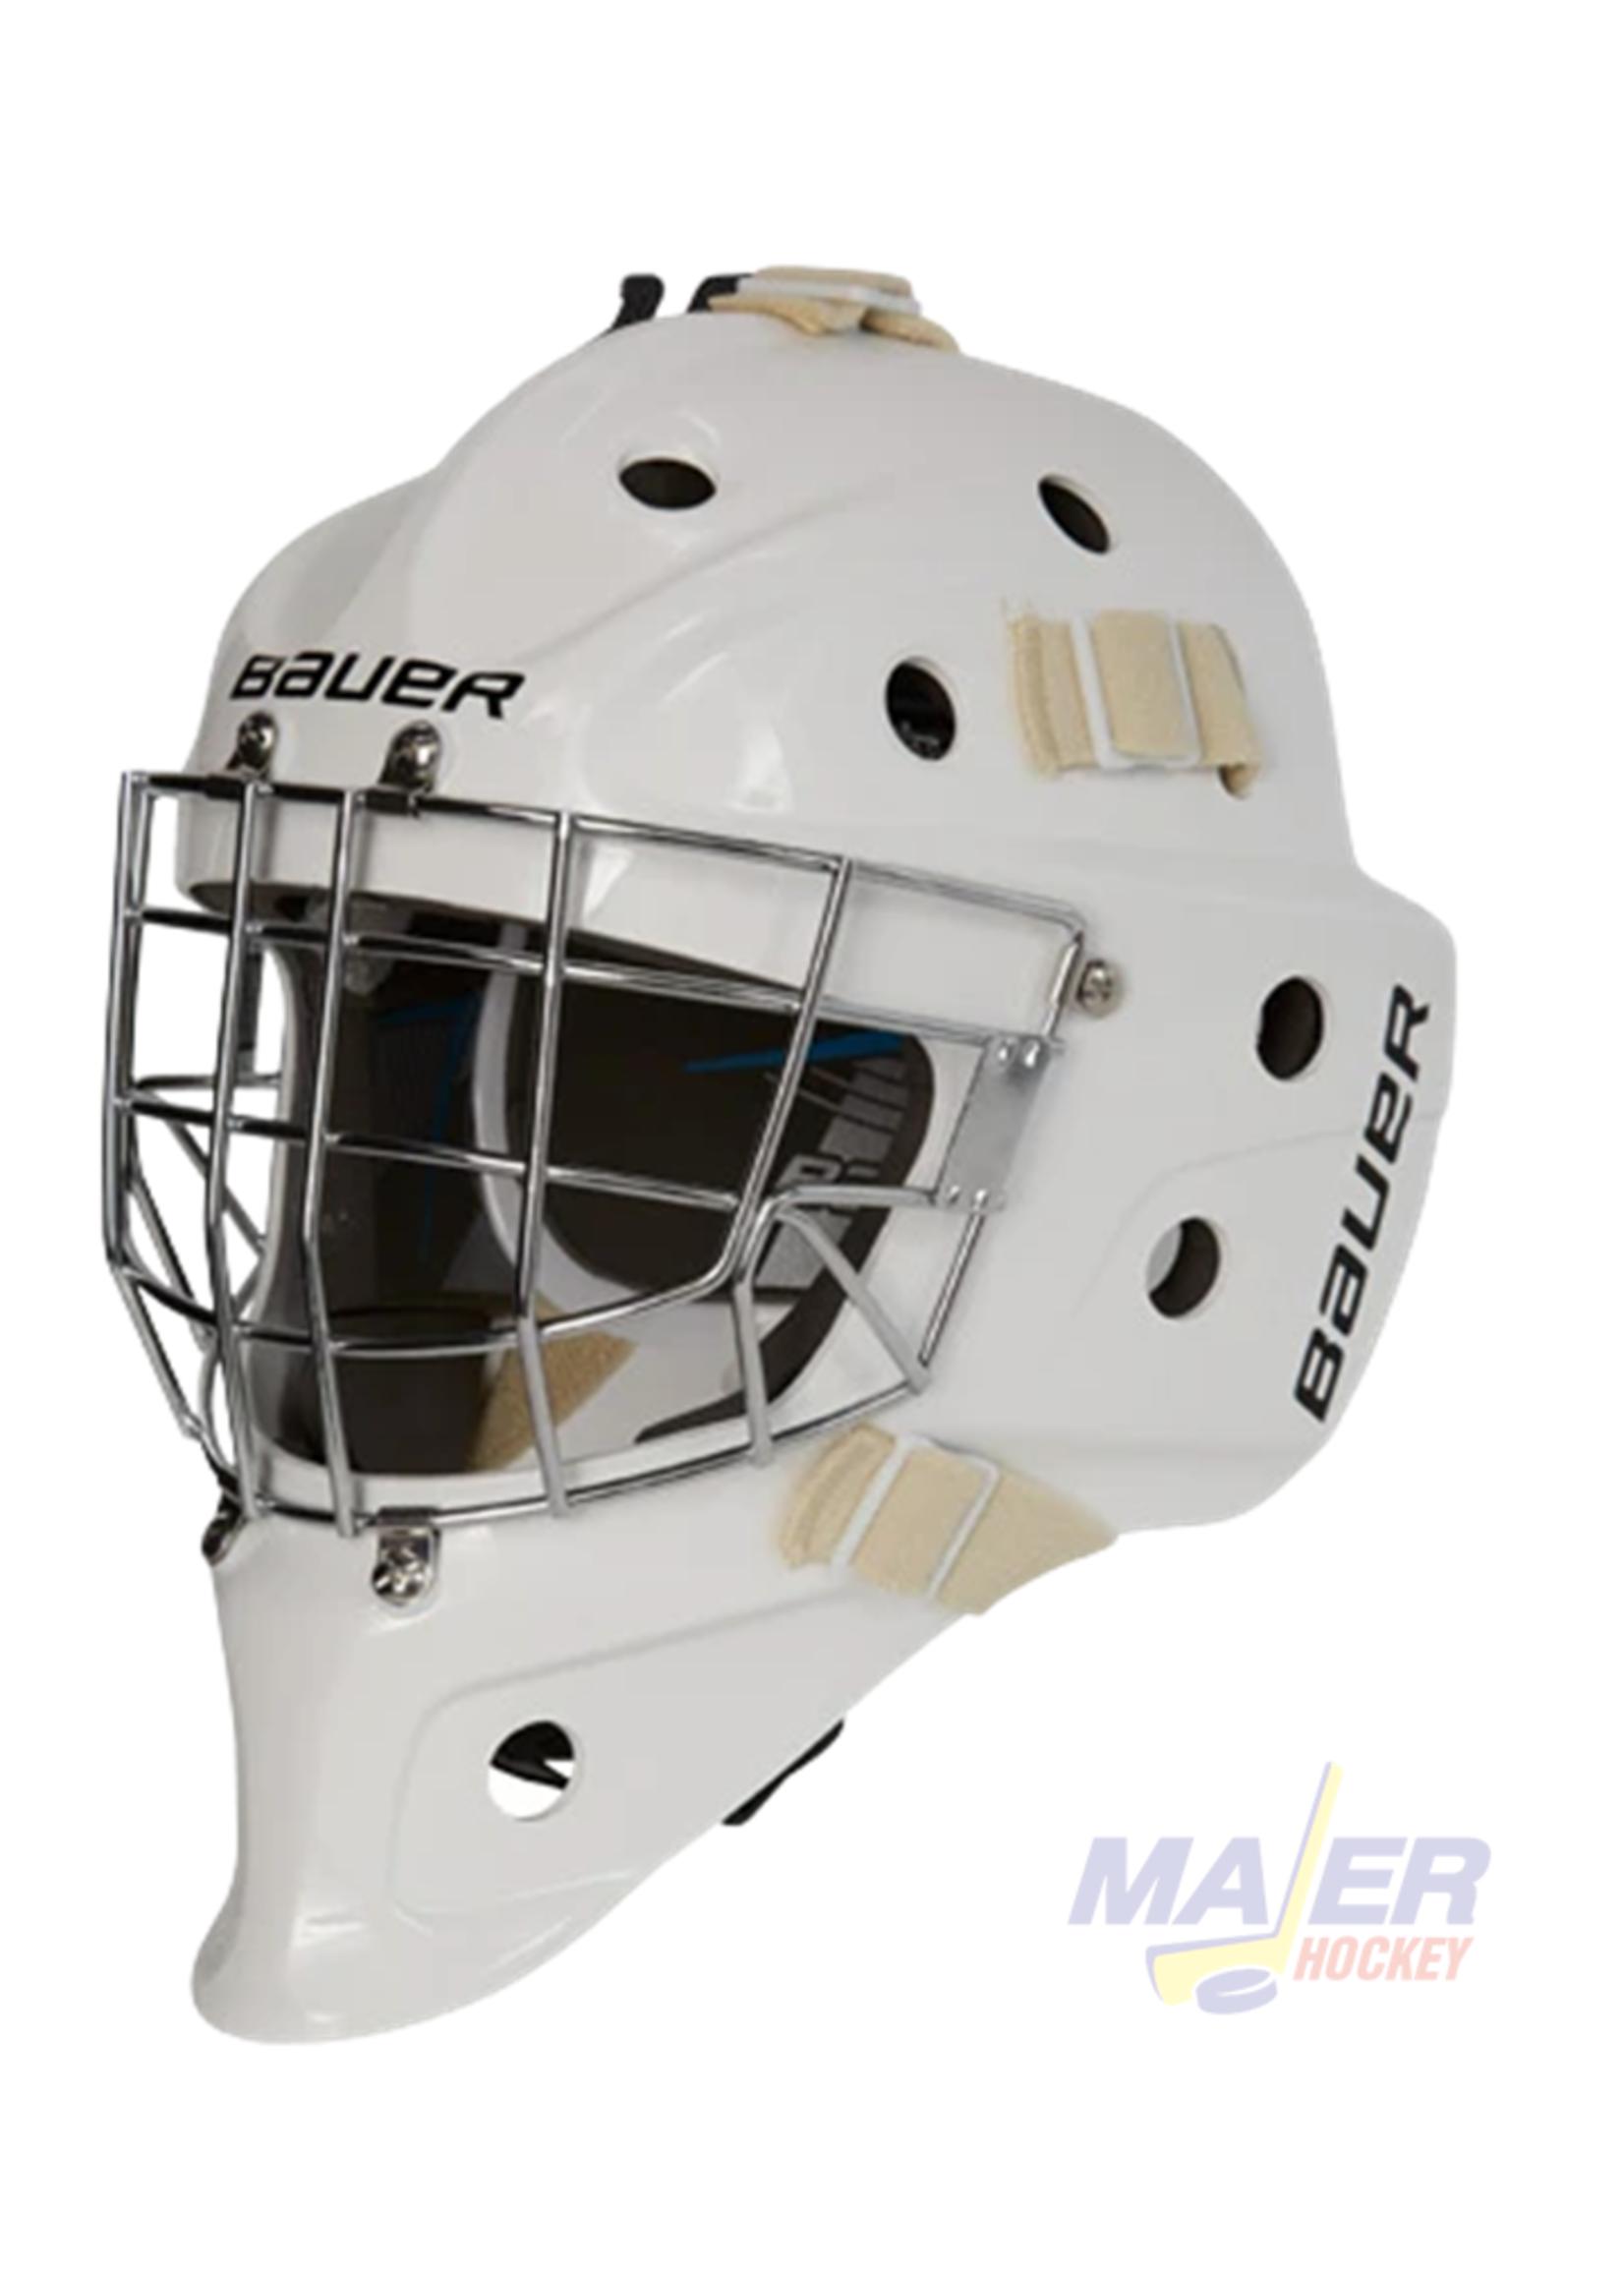 Bauer 930 Senior Goalie Mask